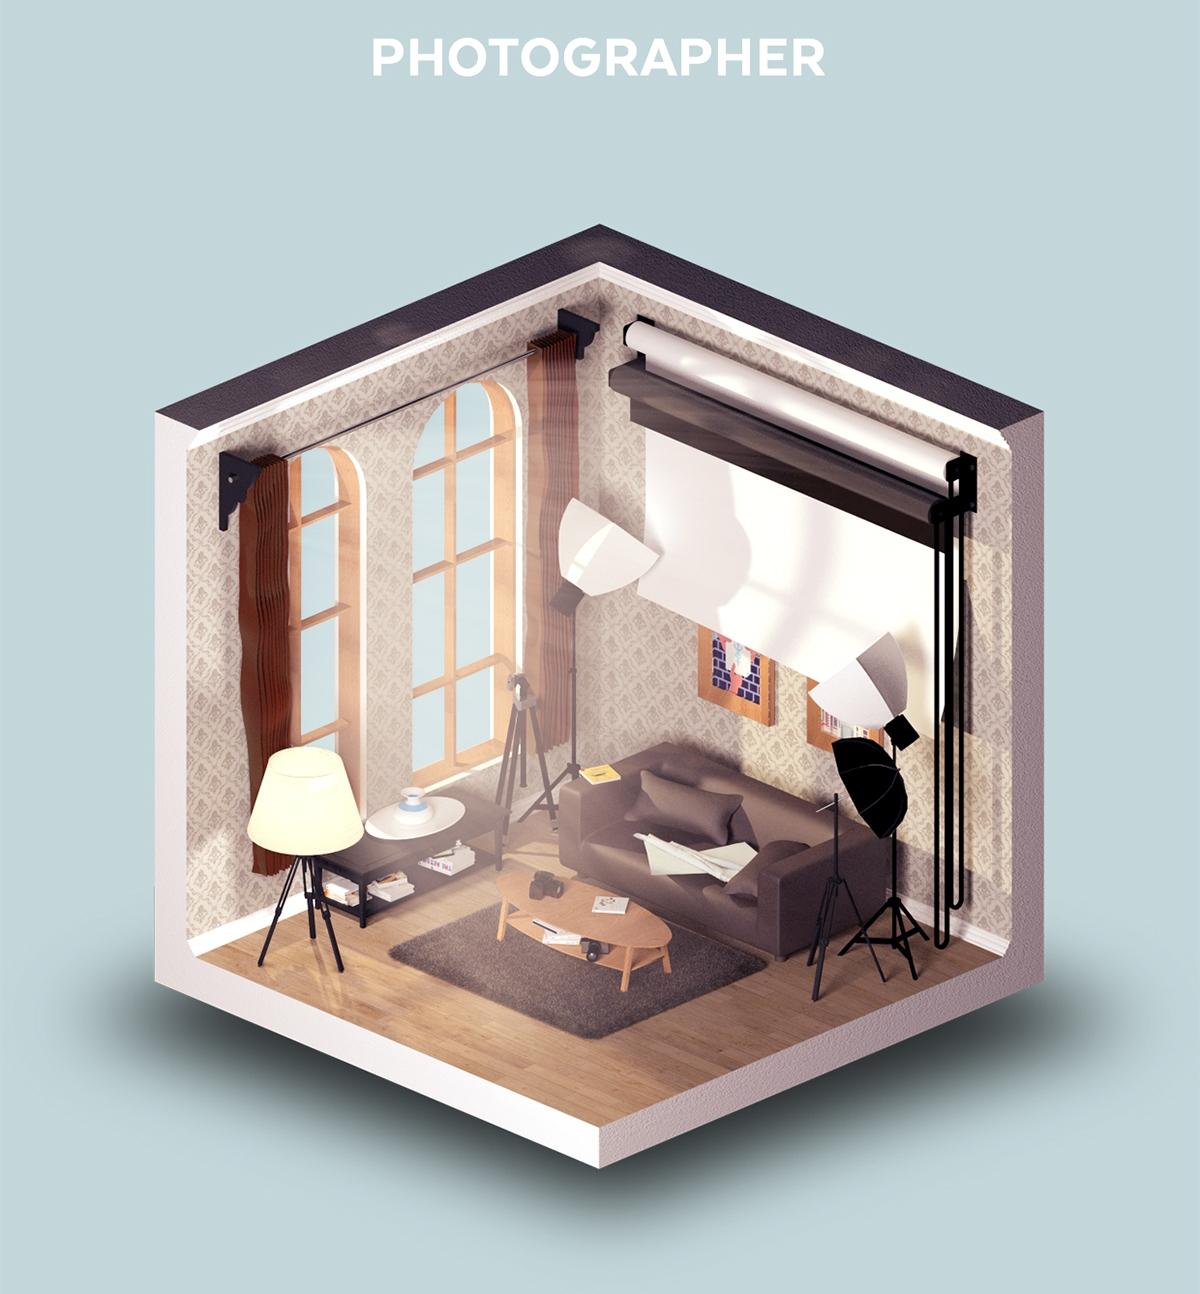 04-Room-of-a-Photographer-Petr-Kollarcik-Digital-Interiors-Design-and-Modern-Nomads-illustrations-www-designstack-co